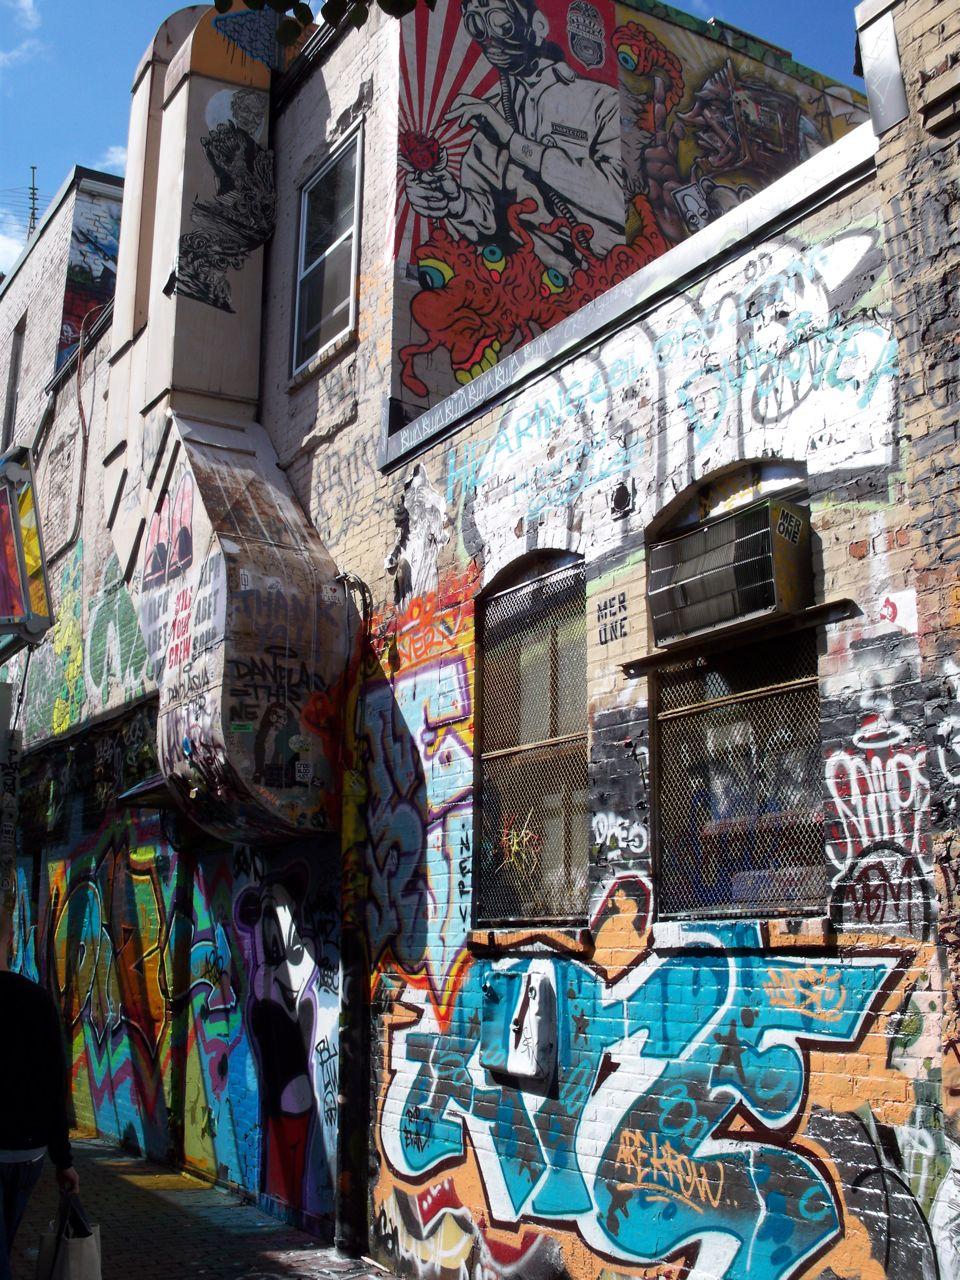 Graffiti wall cambridge - Graffiti Wall Cambridge 17